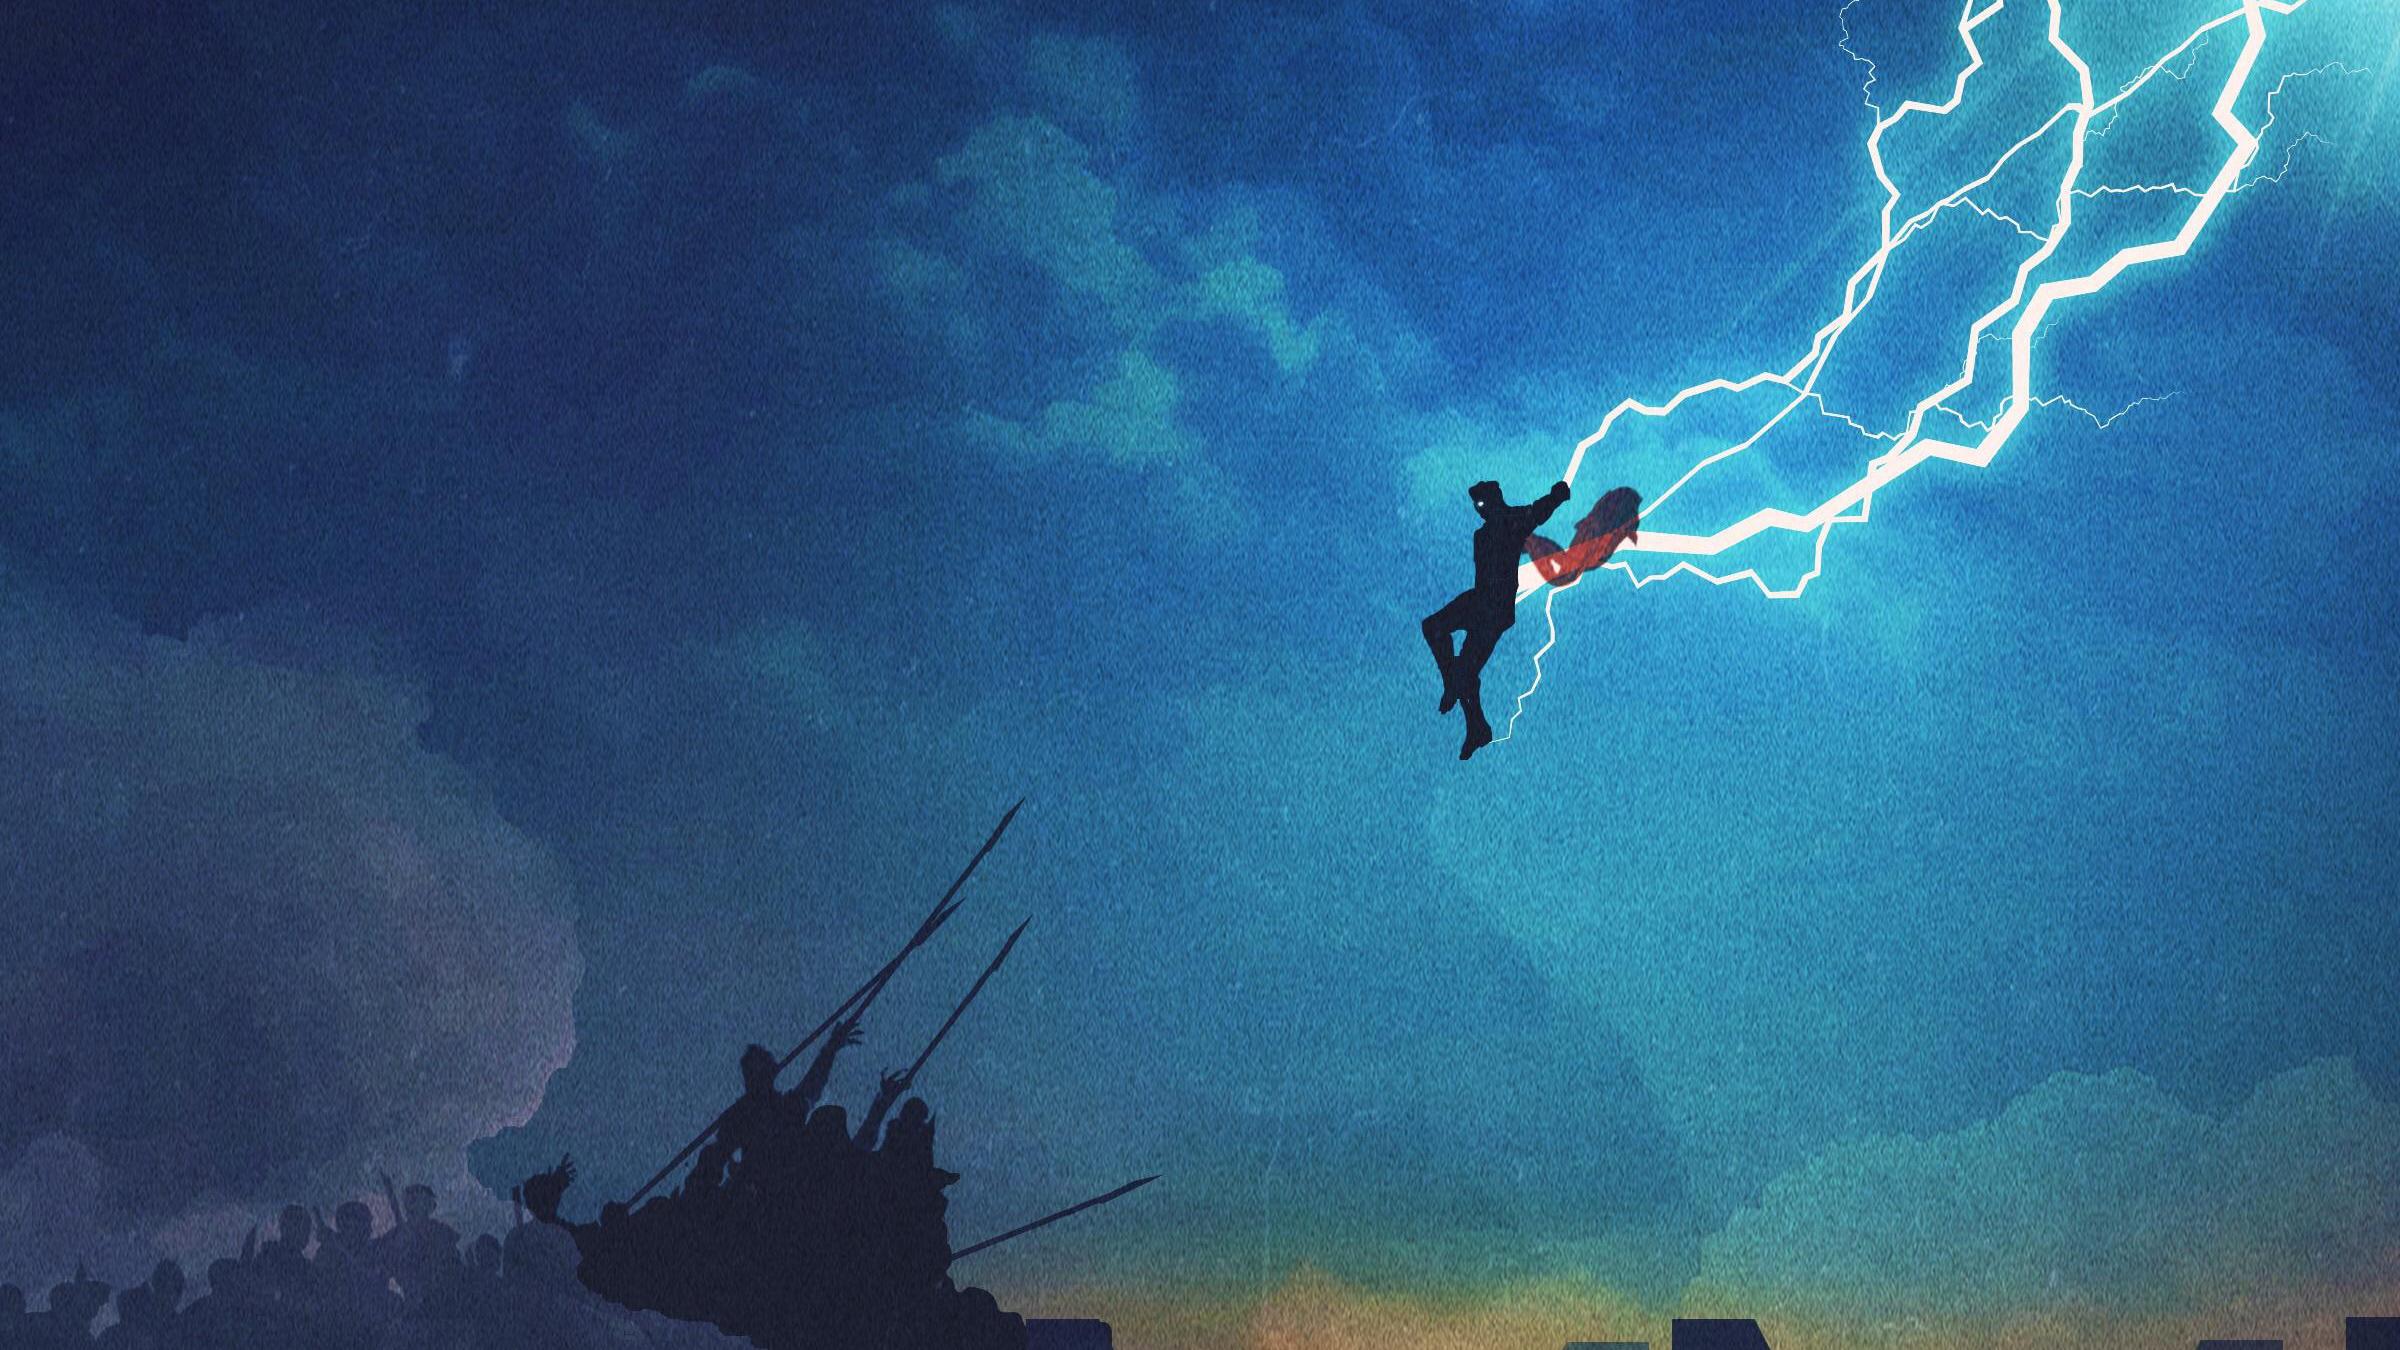 Thor art hd superheroes 4k wallpapers images - Thor art wallpaper ...